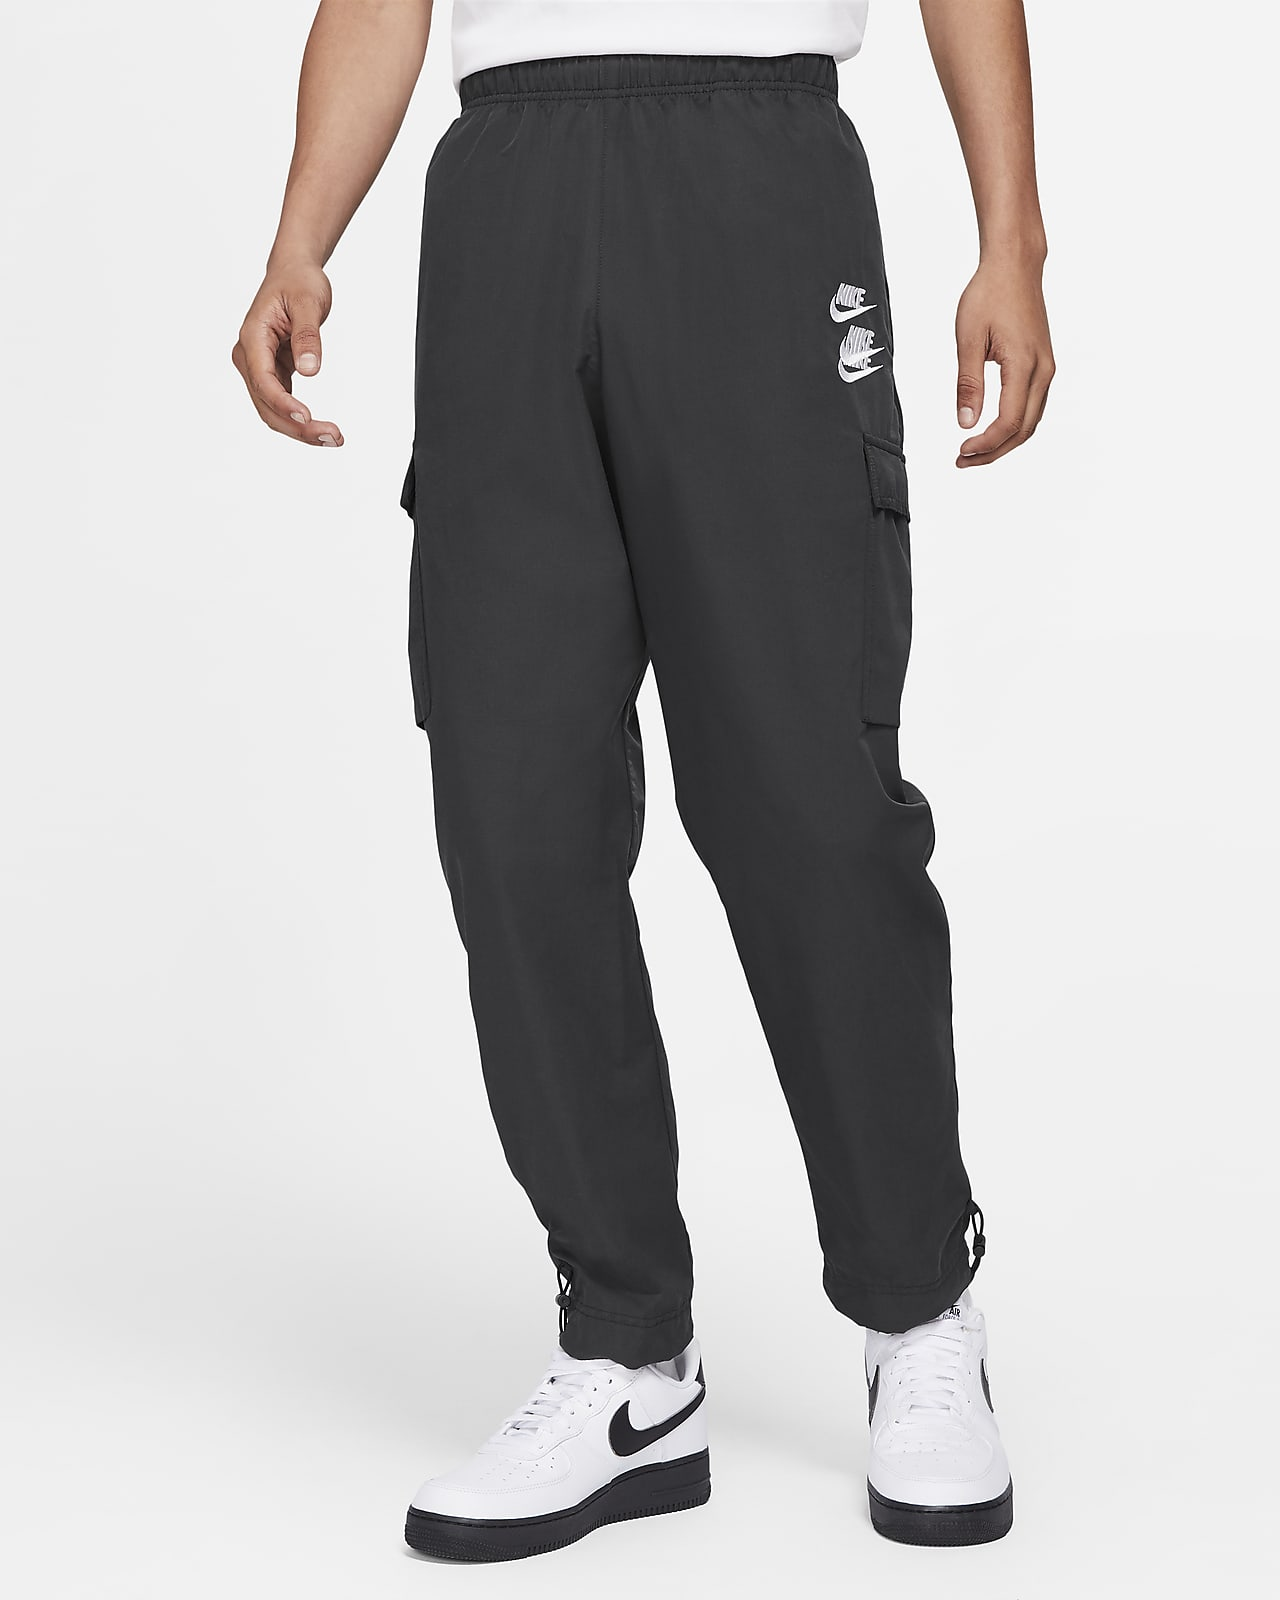 Nike Sportswear 男款梭織工作褲